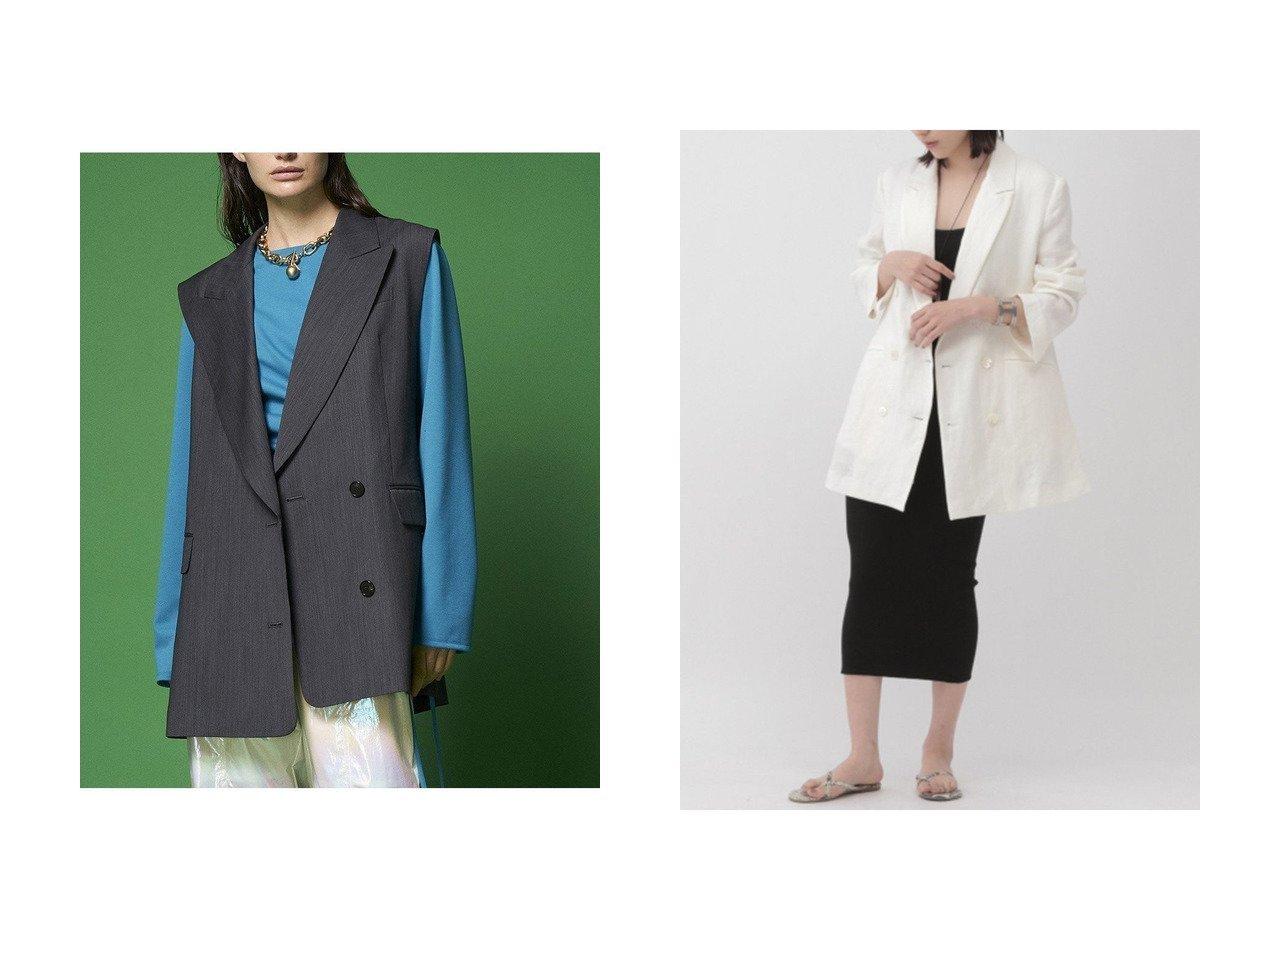 【MAISON SPECIAL/メゾンスペシャル】のバックオープンジレ&【Chaos/カオス】のオーガニックジャケット 【アウター】おすすめ!人気、トレンド・レディースファッションの通販 おすすめで人気の流行・トレンド、ファッションの通販商品 メンズファッション・キッズファッション・インテリア・家具・レディースファッション・服の通販 founy(ファニー) https://founy.com/ ファッション Fashion レディースファッション WOMEN アウター Coat Outerwear ジャケット Jackets ジャケット タンブラー ダブル キュプラ クラシカル ベスト マニッシュ |ID:crp329100000030211